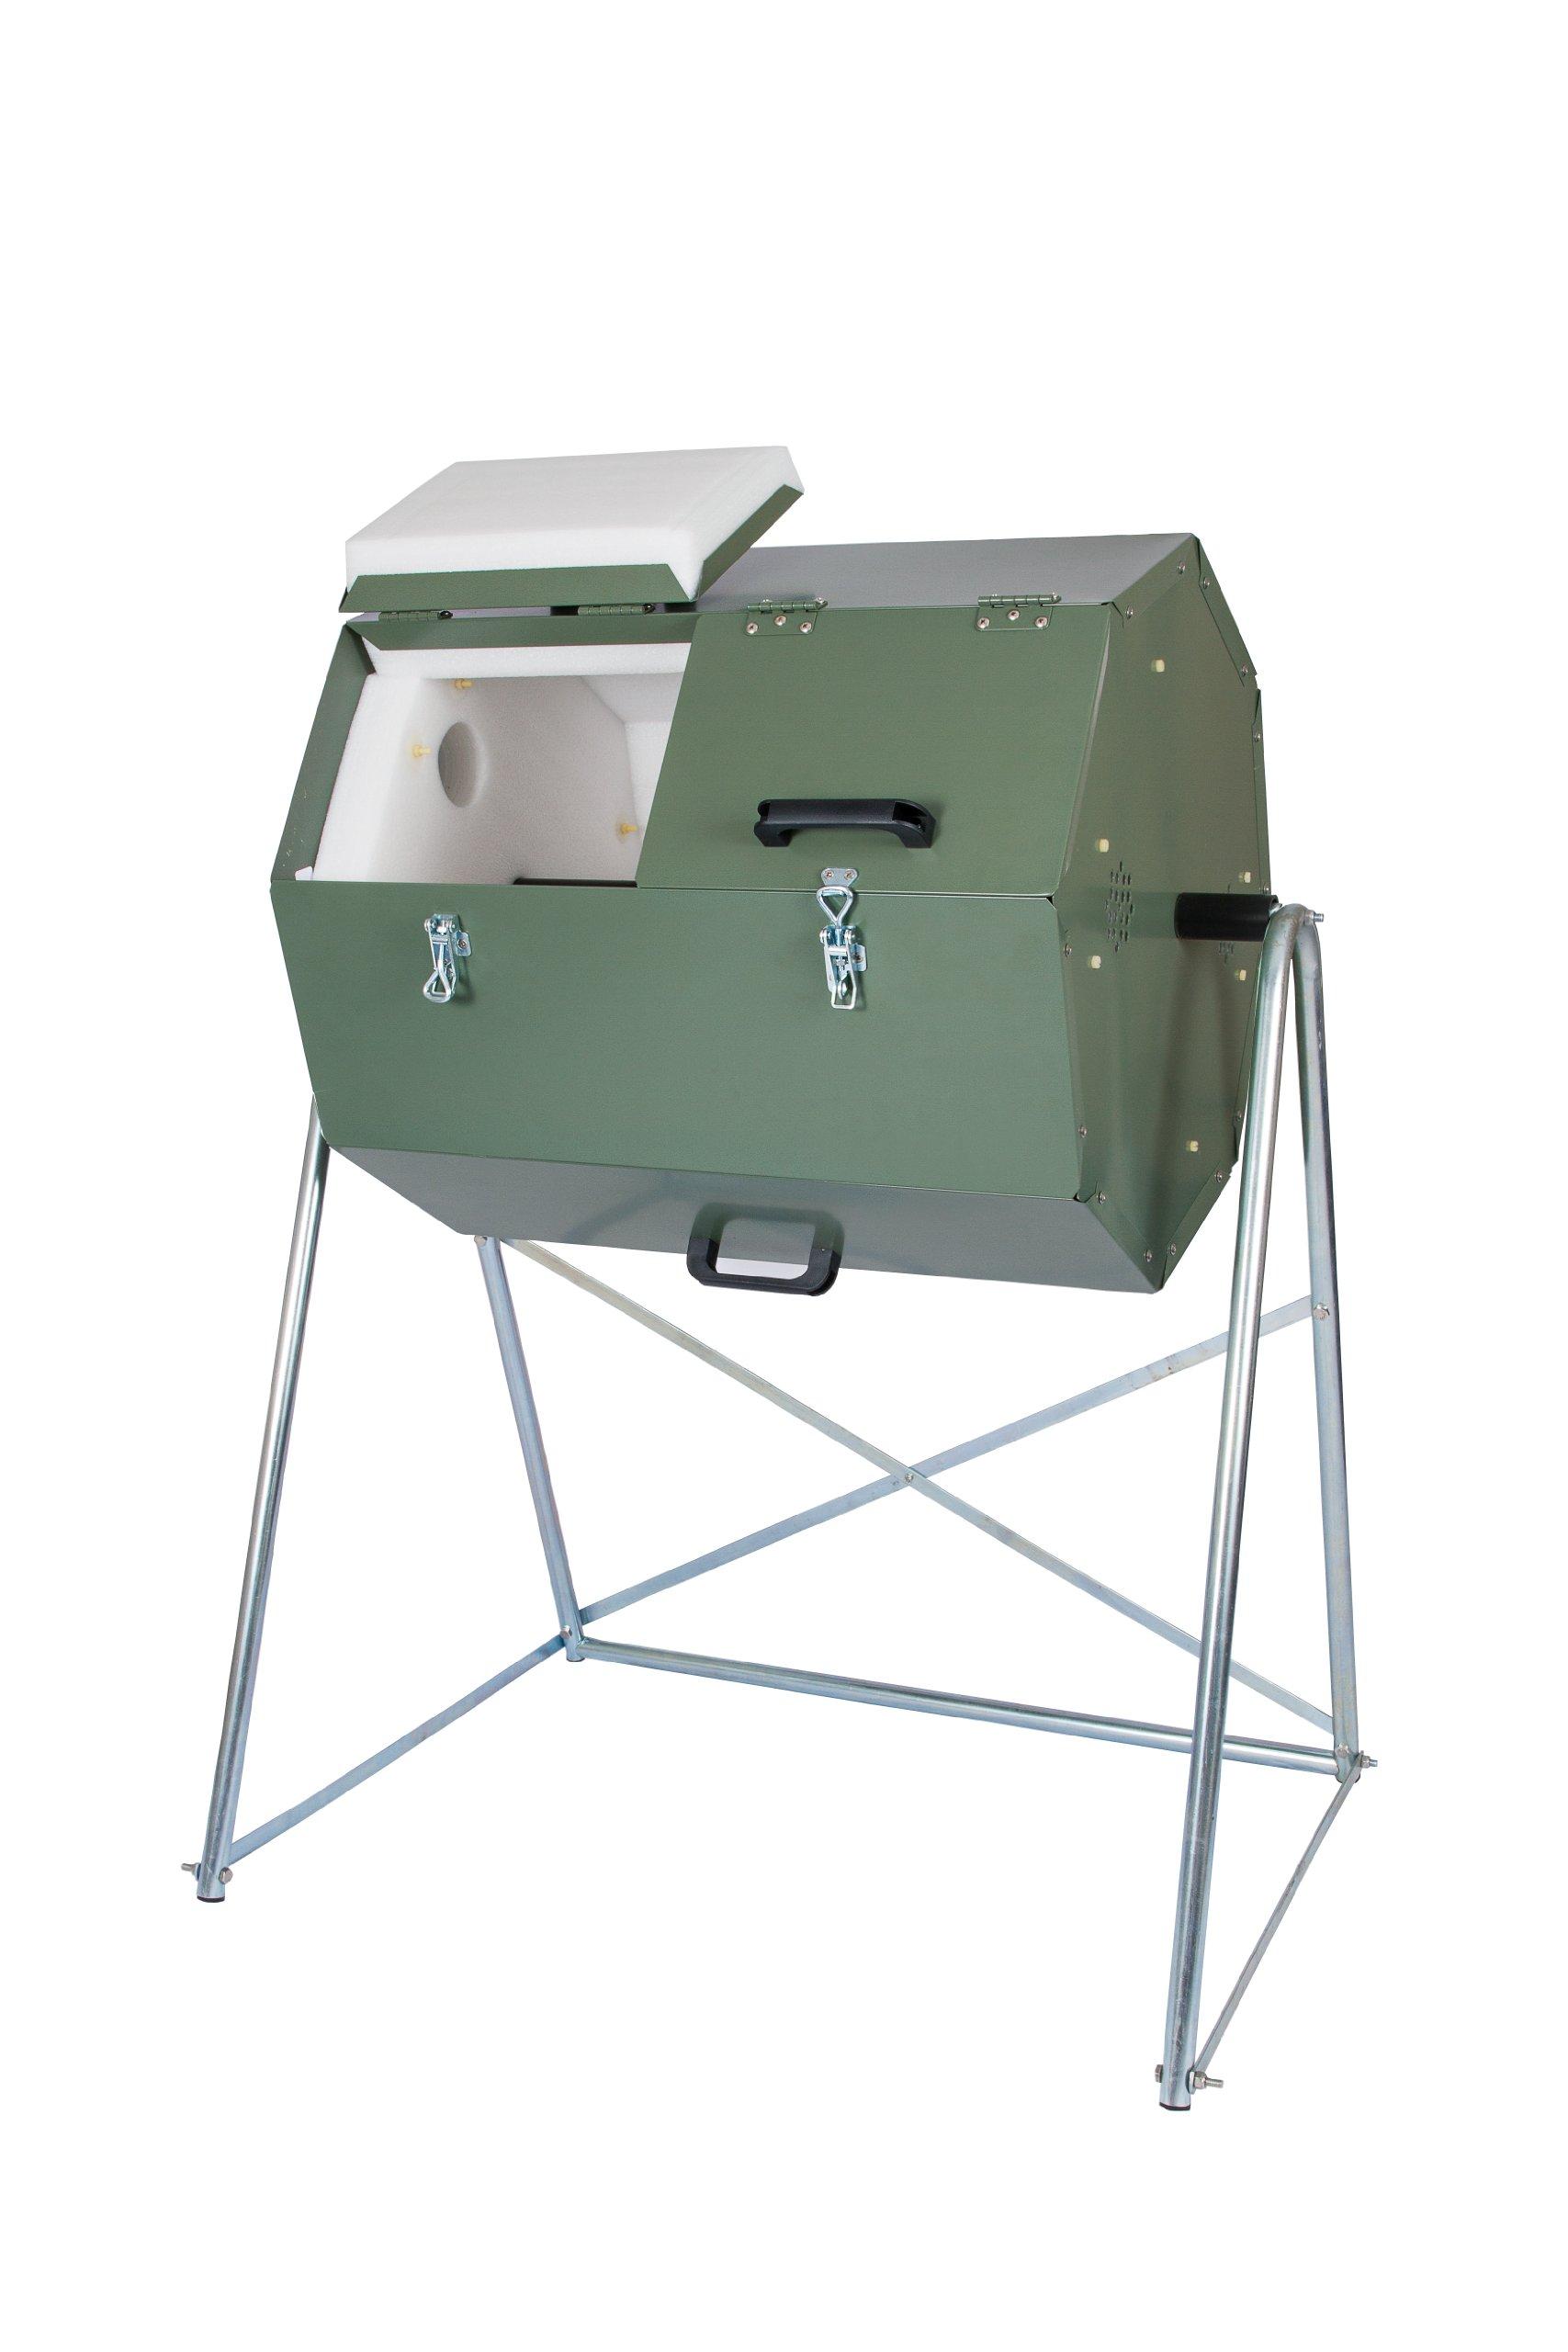 Joraform Compost Tumbler JK 125 by Joraform Composter